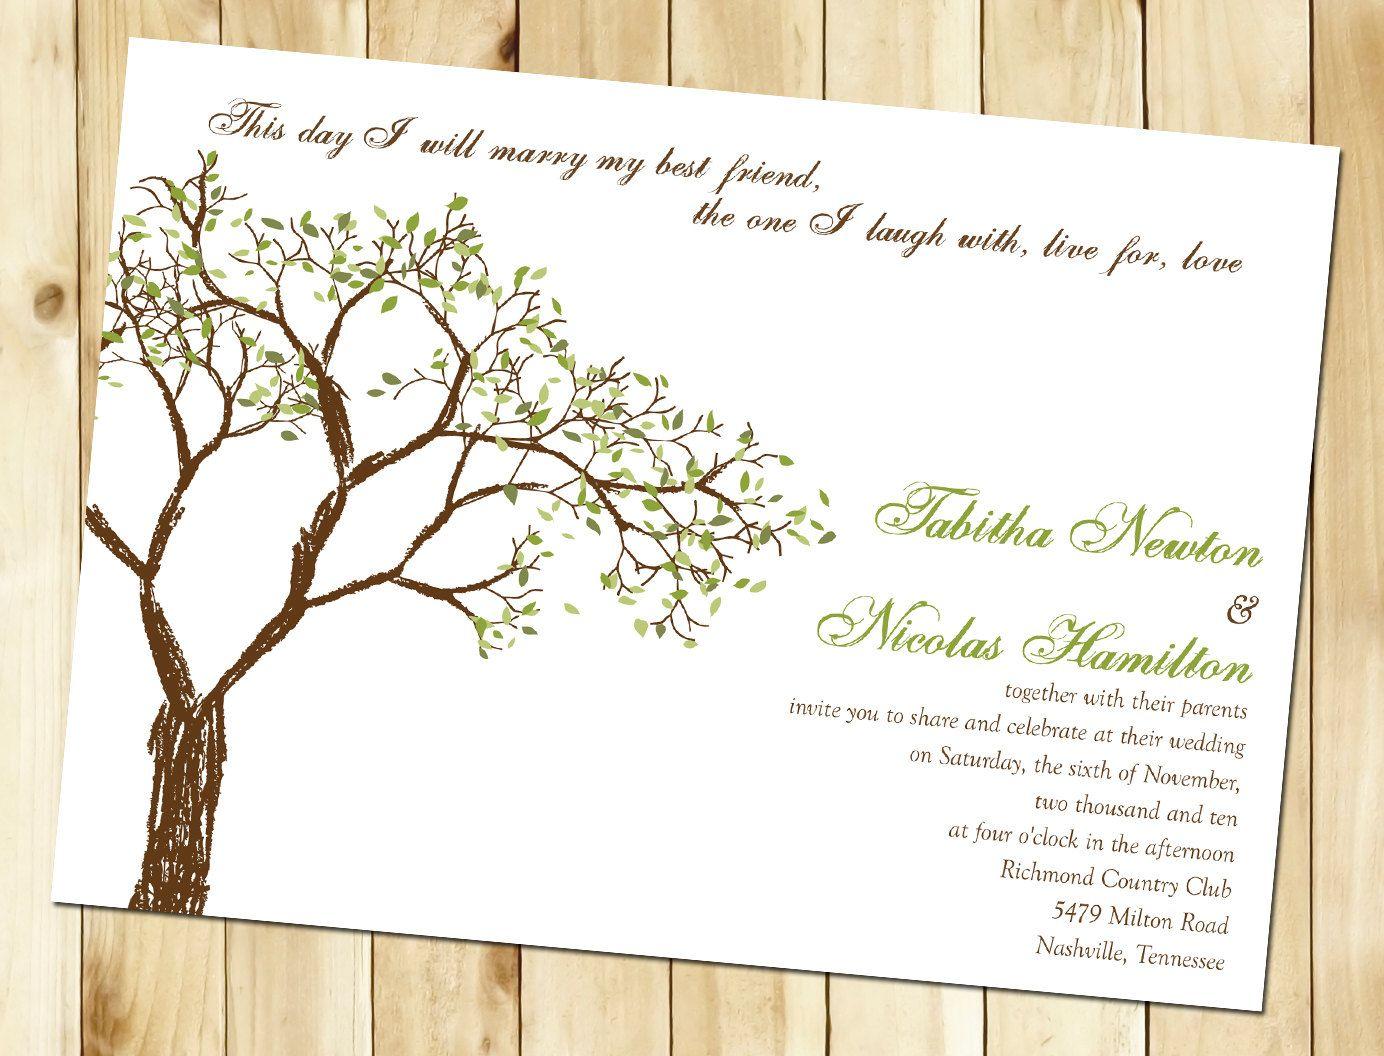 etsy wedding invitations Fall Tree Wedding Invitation Sample by nmiphotocreations on Etsy 3 00 a little sneak peak